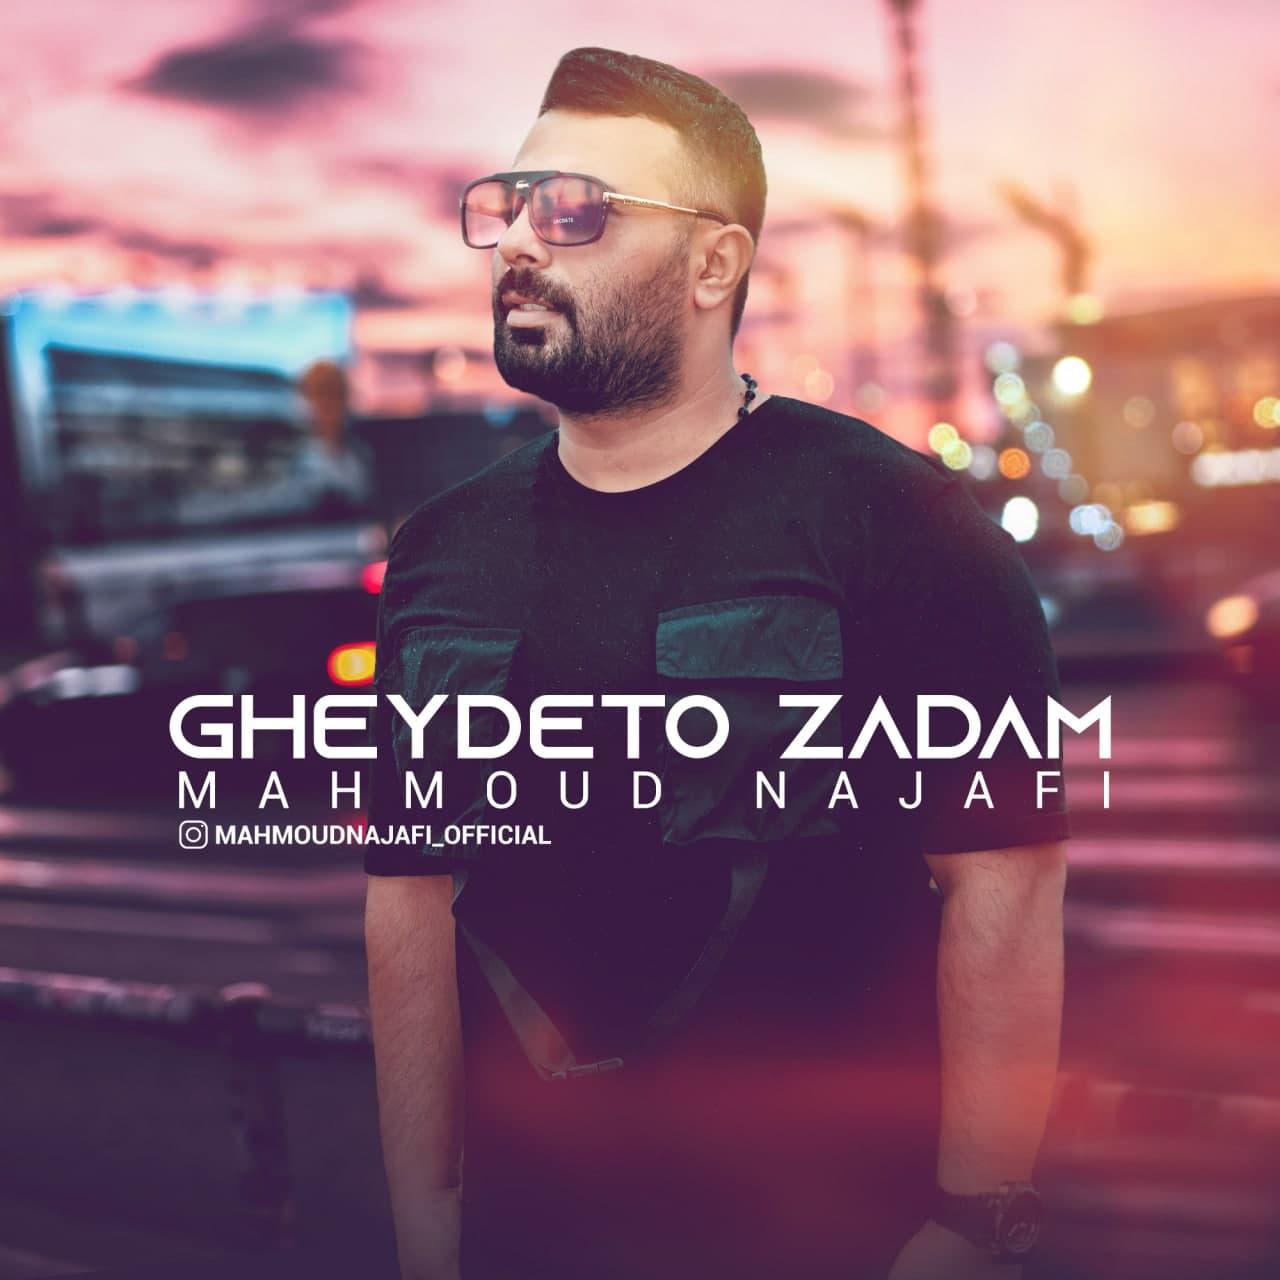 Mahmoud Najafi – Gheydeto Zadam